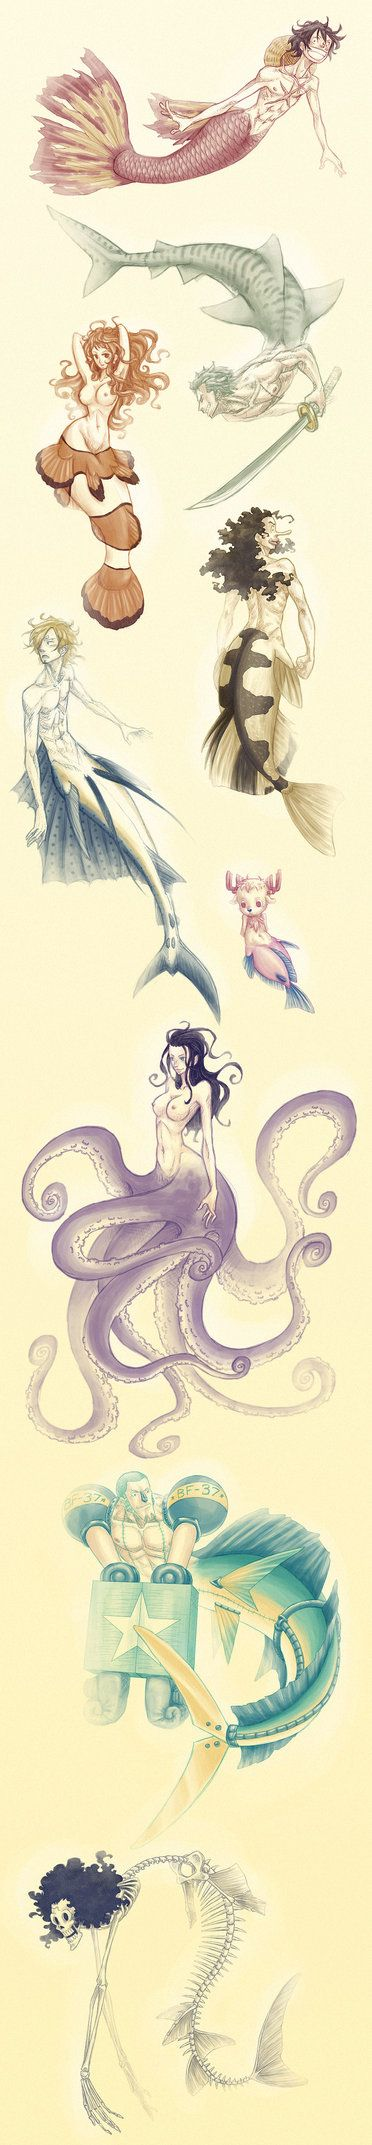 Mer-Strawhats by SybLaTortue.Luffy : Guppy merman Zoro : Tiger shark merman Nami : Clownfish mermaid Usopp : Archerfish merman Sanji : Sailfish merman  Chopper : Surgeonfish mer-reindeer Robin : Purple octopus mermaid Franky : Mahi-mahi cyborg merman Brook : Dead sturgeon merman,one piece